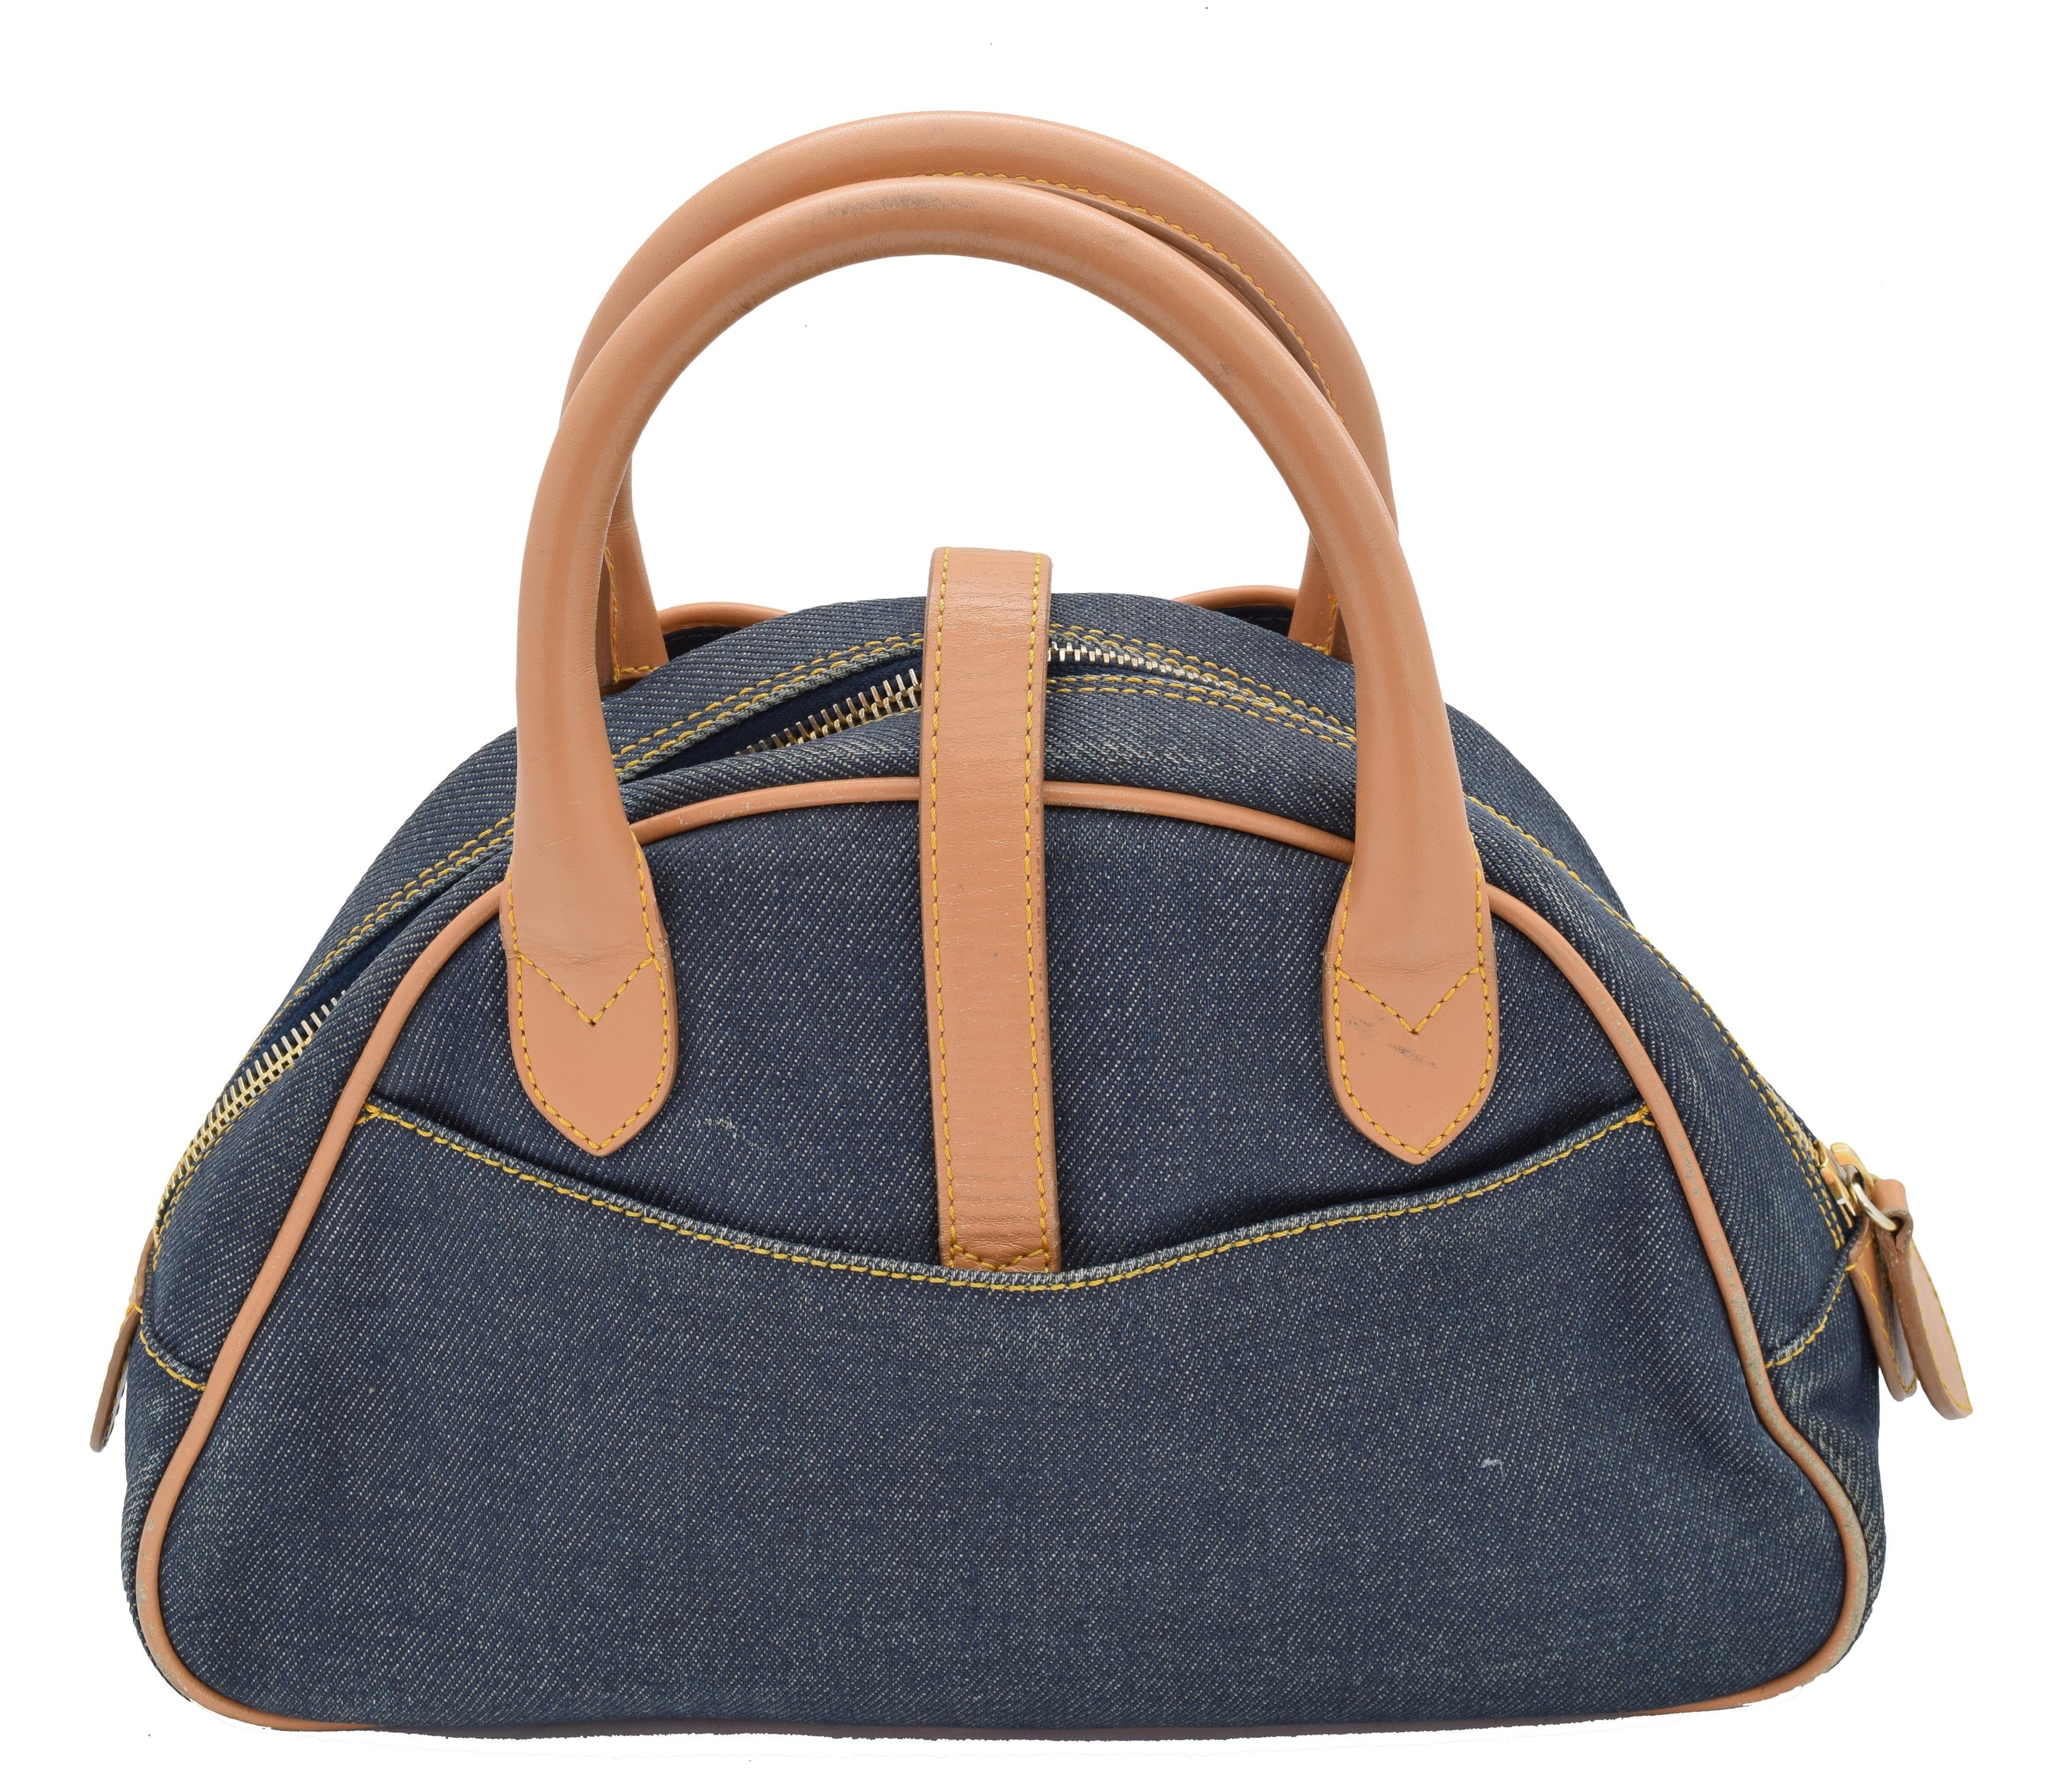 A Dior Double Saddle bag, - Image 2 of 2